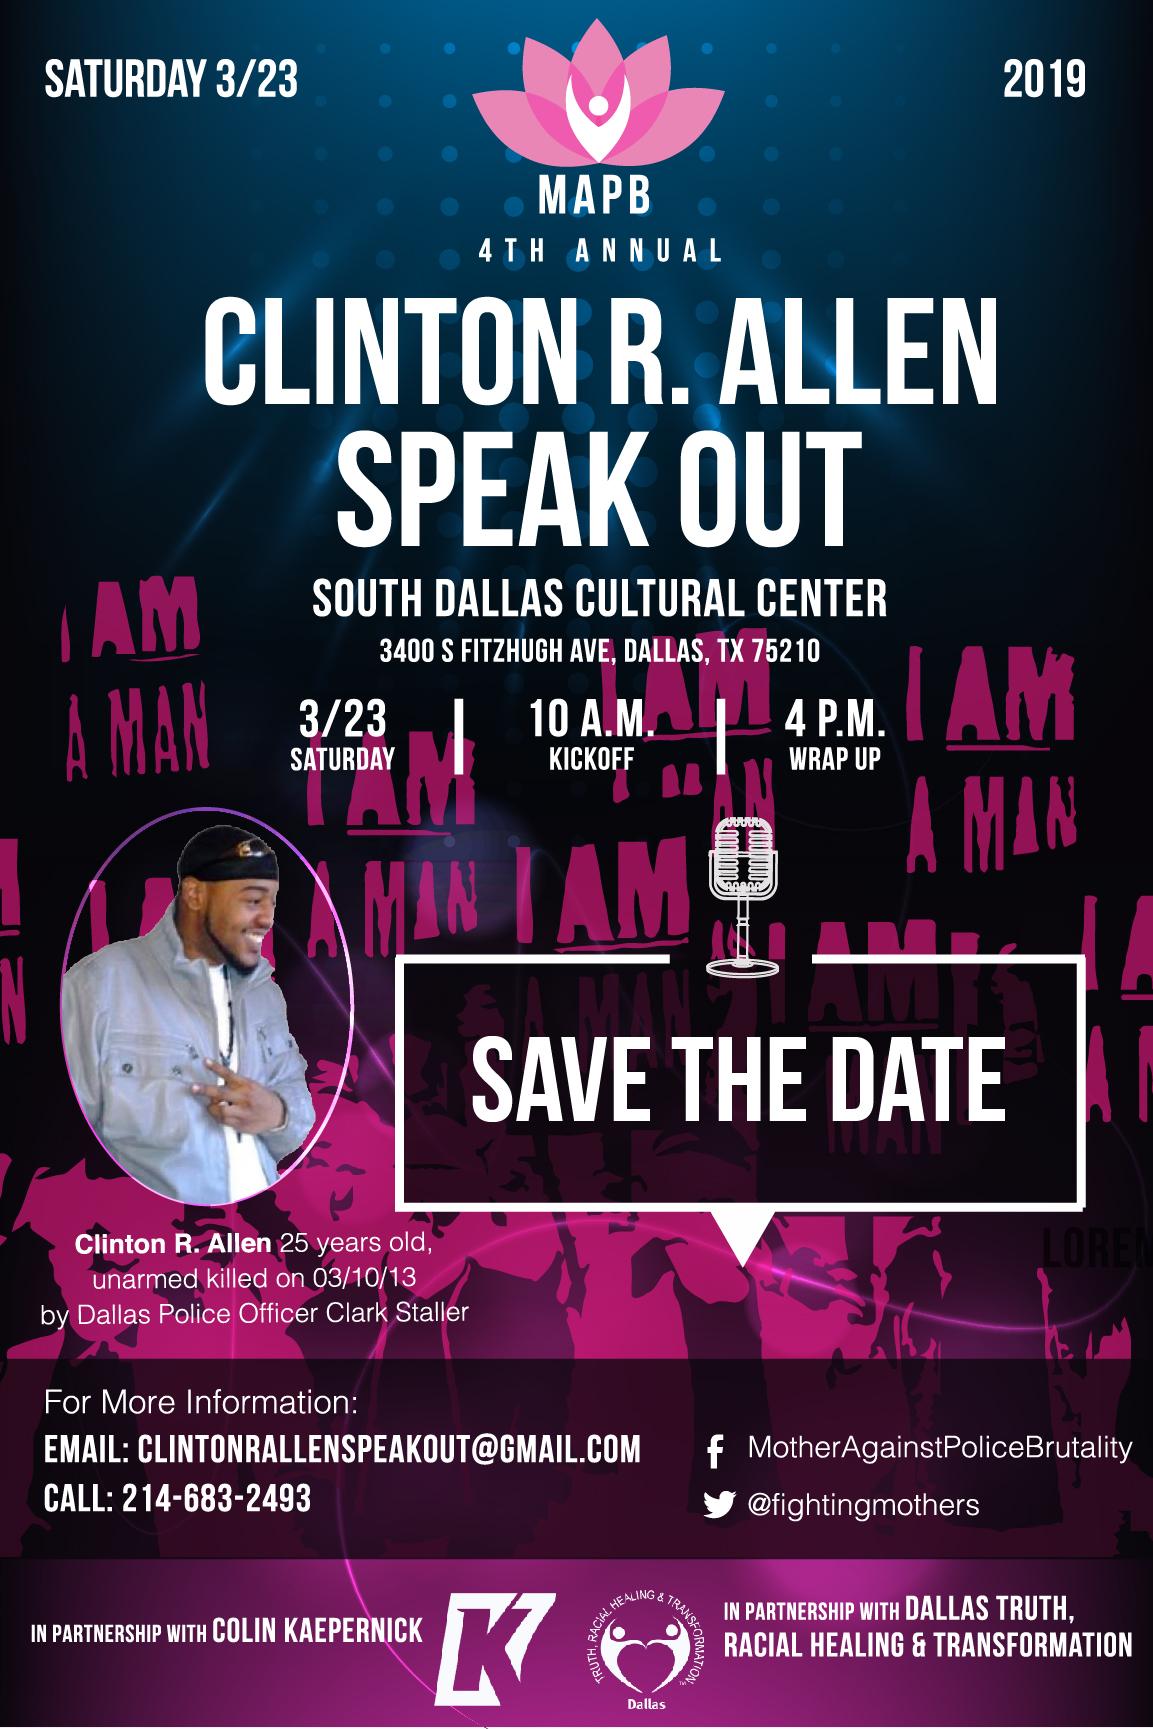 Attend the 4th Annual Clinton R. Allen Speak Out! March 23, 2019- Dallas Texas!